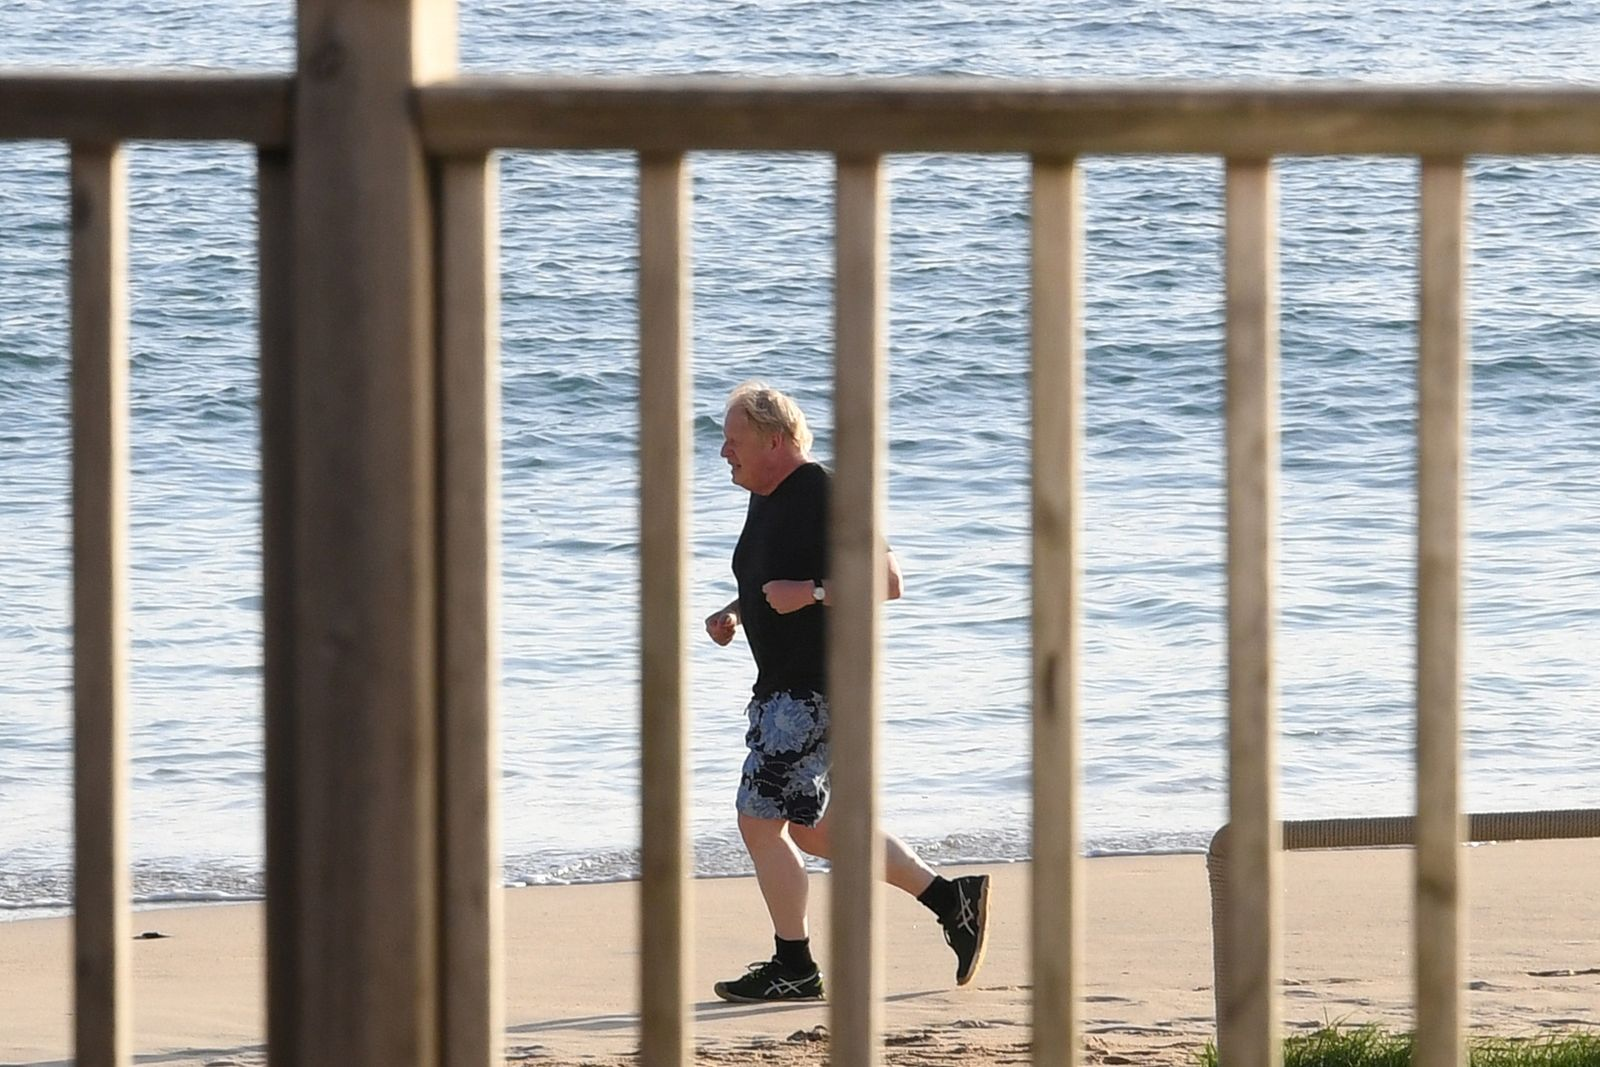 Britain's Prime Minister Johnson runs along the beach in Carbis Bay